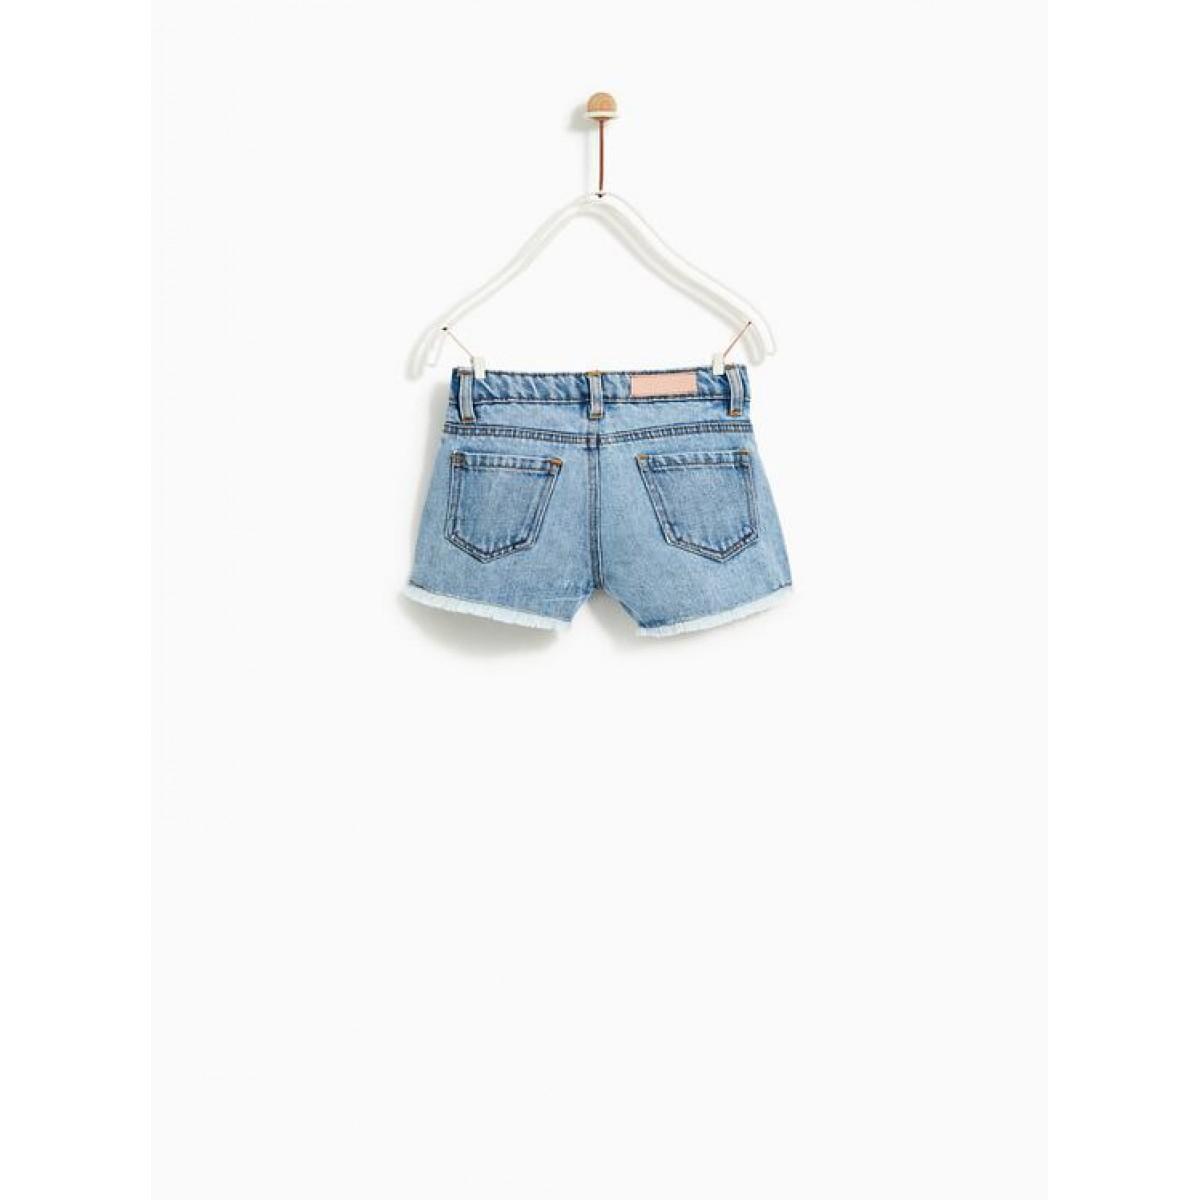 Zara Sequinned Bermuda Shorts